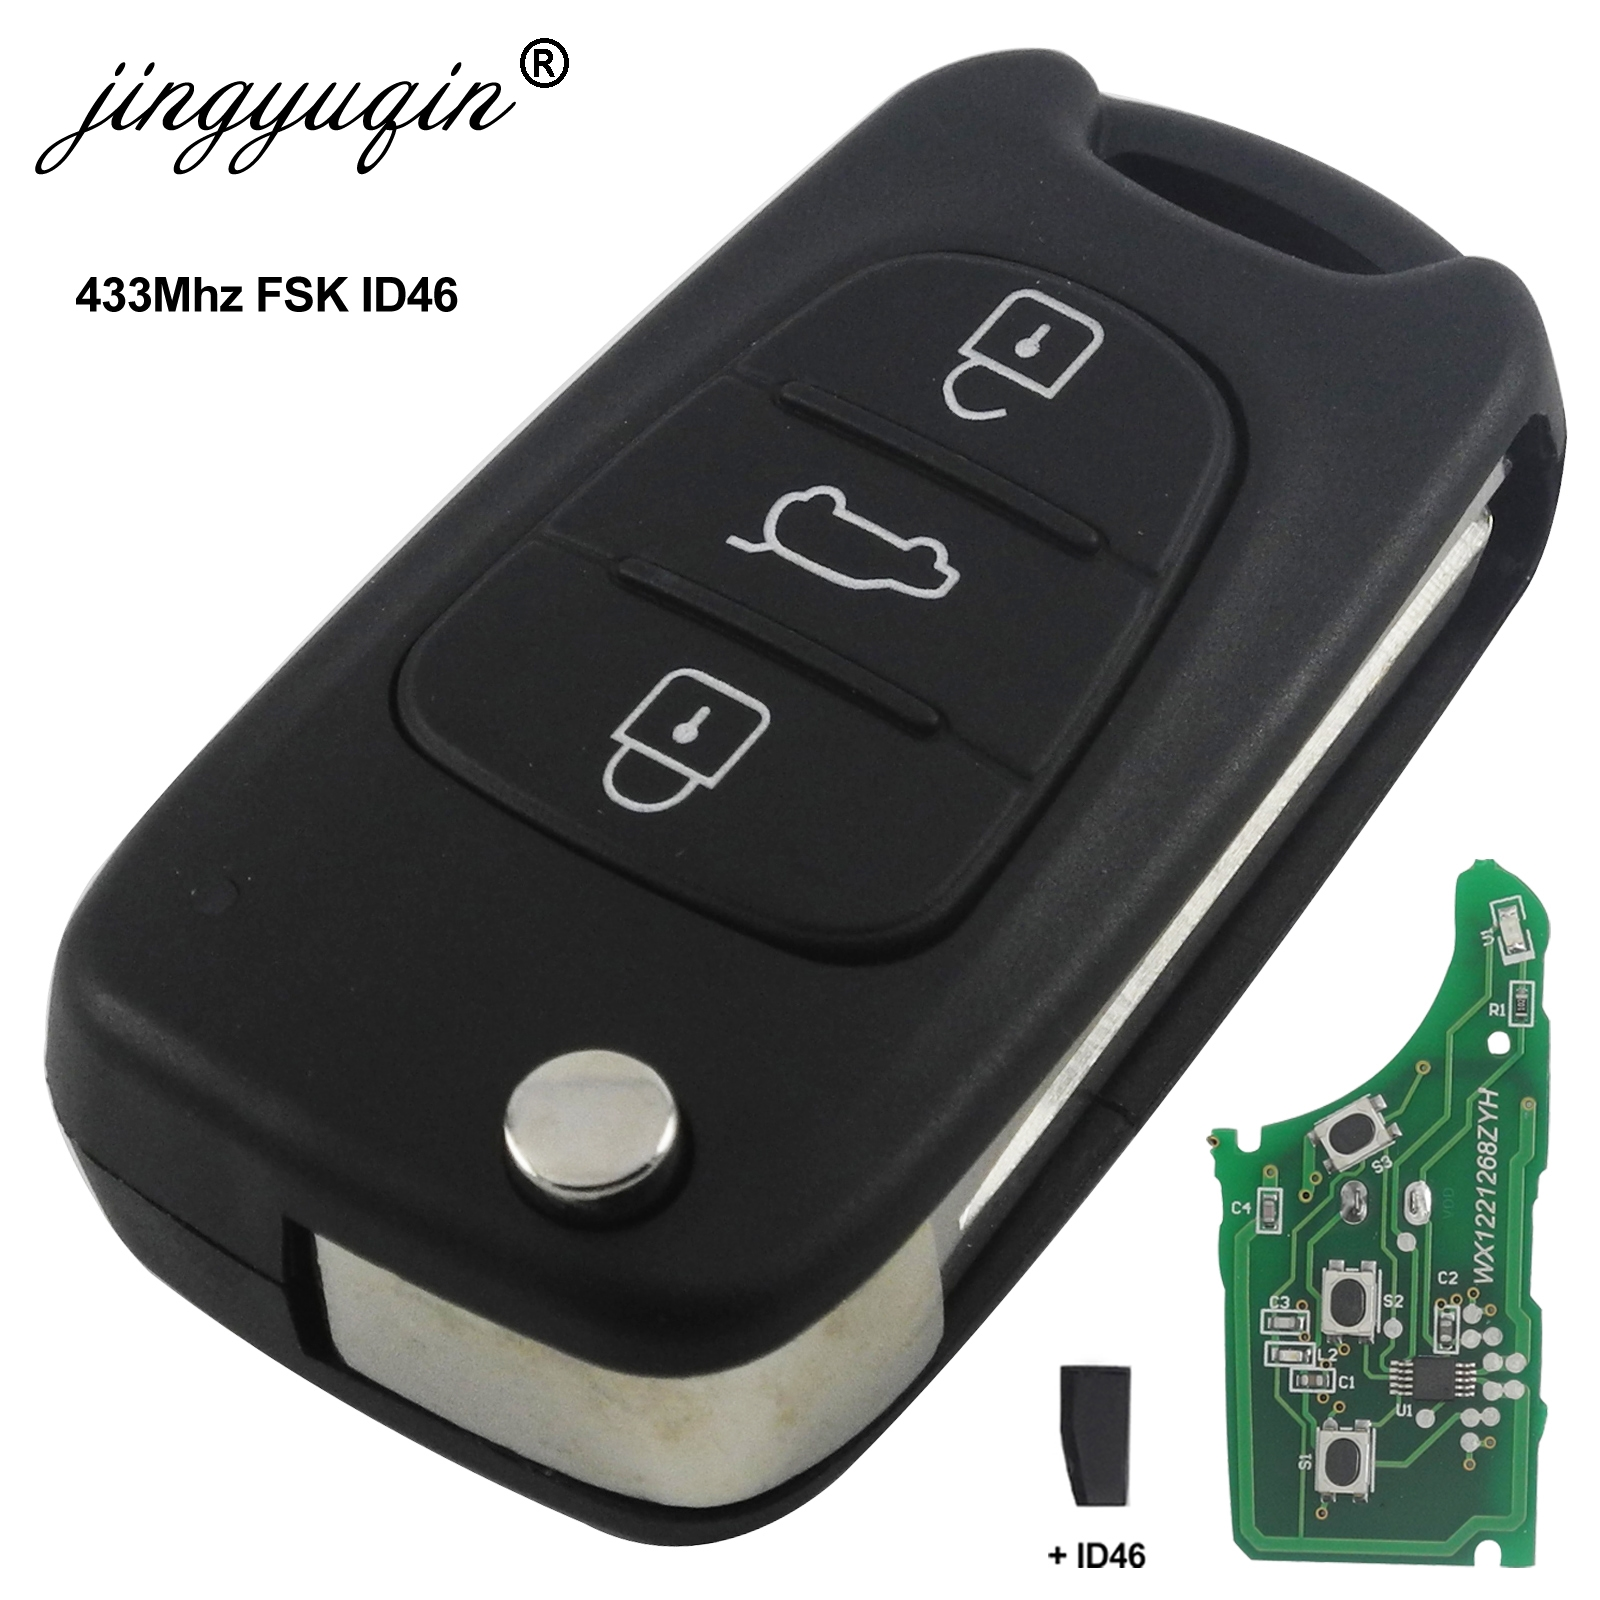 Jingyuqin para hyundai i20 i30 ix35 avante 433 mhz id46 chip 3 botões flip dobrável carro remoto chave fob